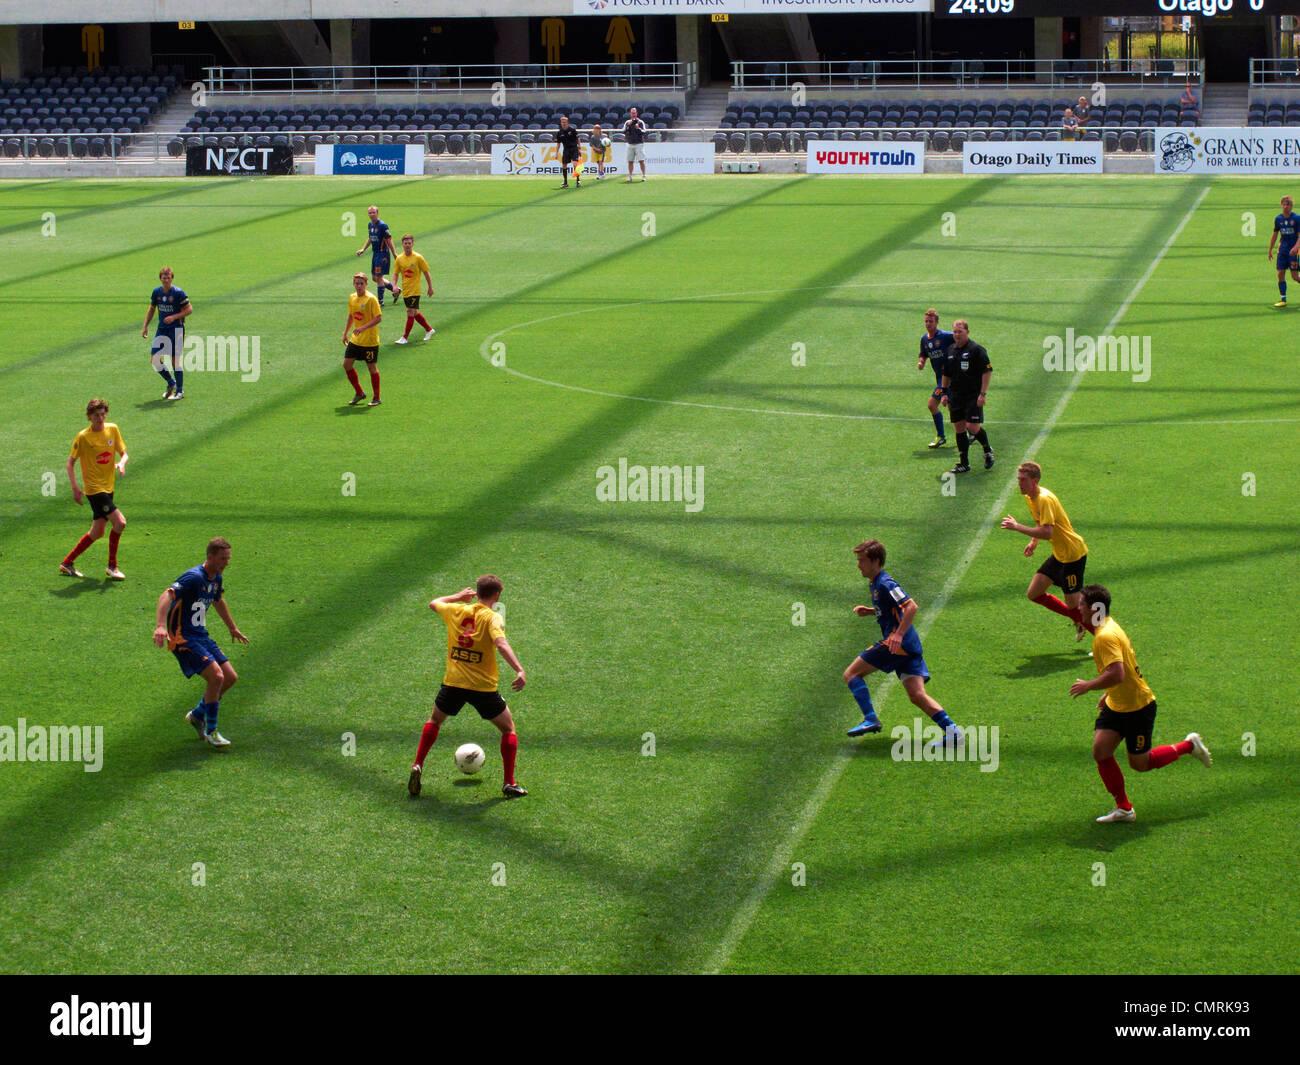 Football game, Forsyth Barr Stadium, Dunedin, South Island, New Zealand - Stock Image